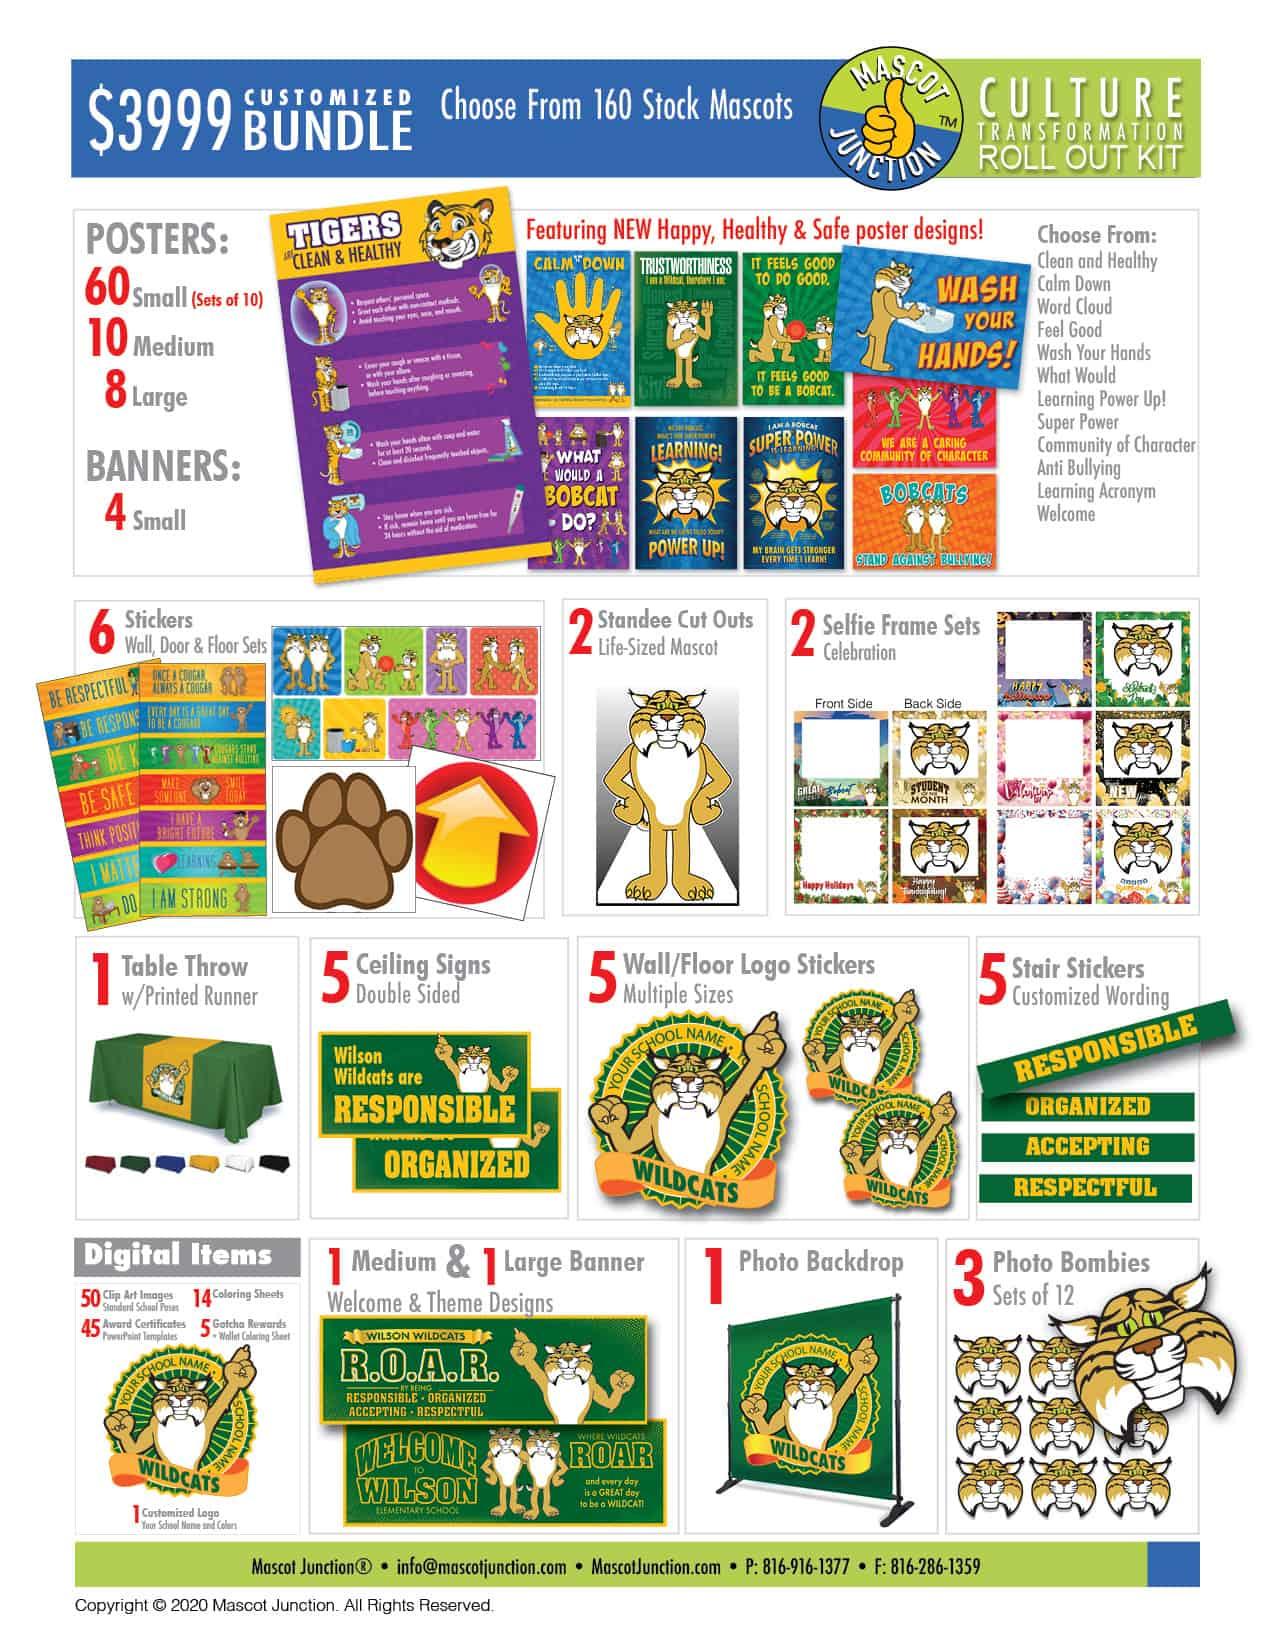 $3999 Customized - Culture Bundle Catalog Page - 2020B